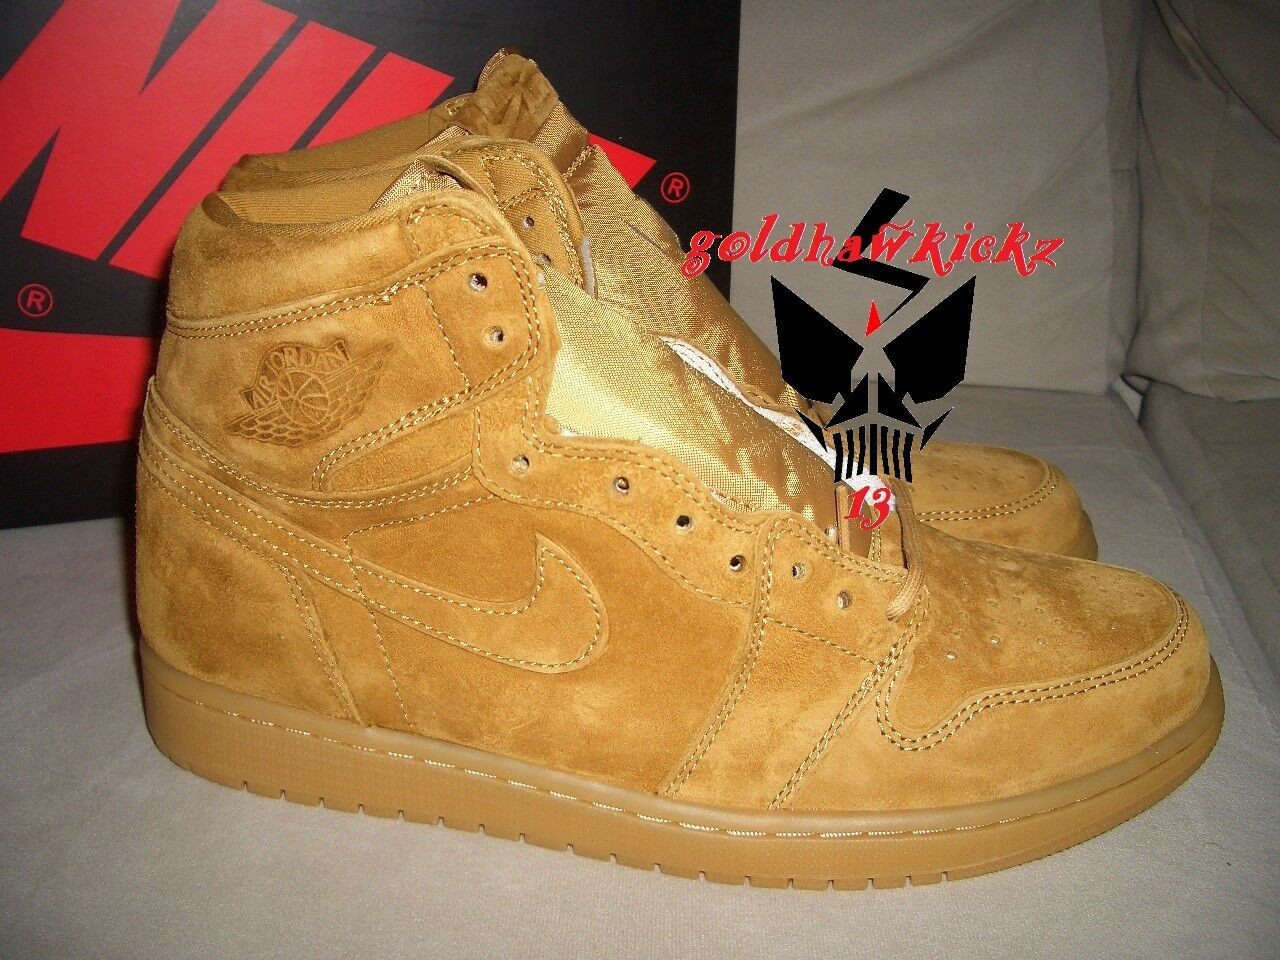 Nike flachs air jordan 1 hohe og flachs Nike goldene ernte kaugummi sole 555088-710 848862